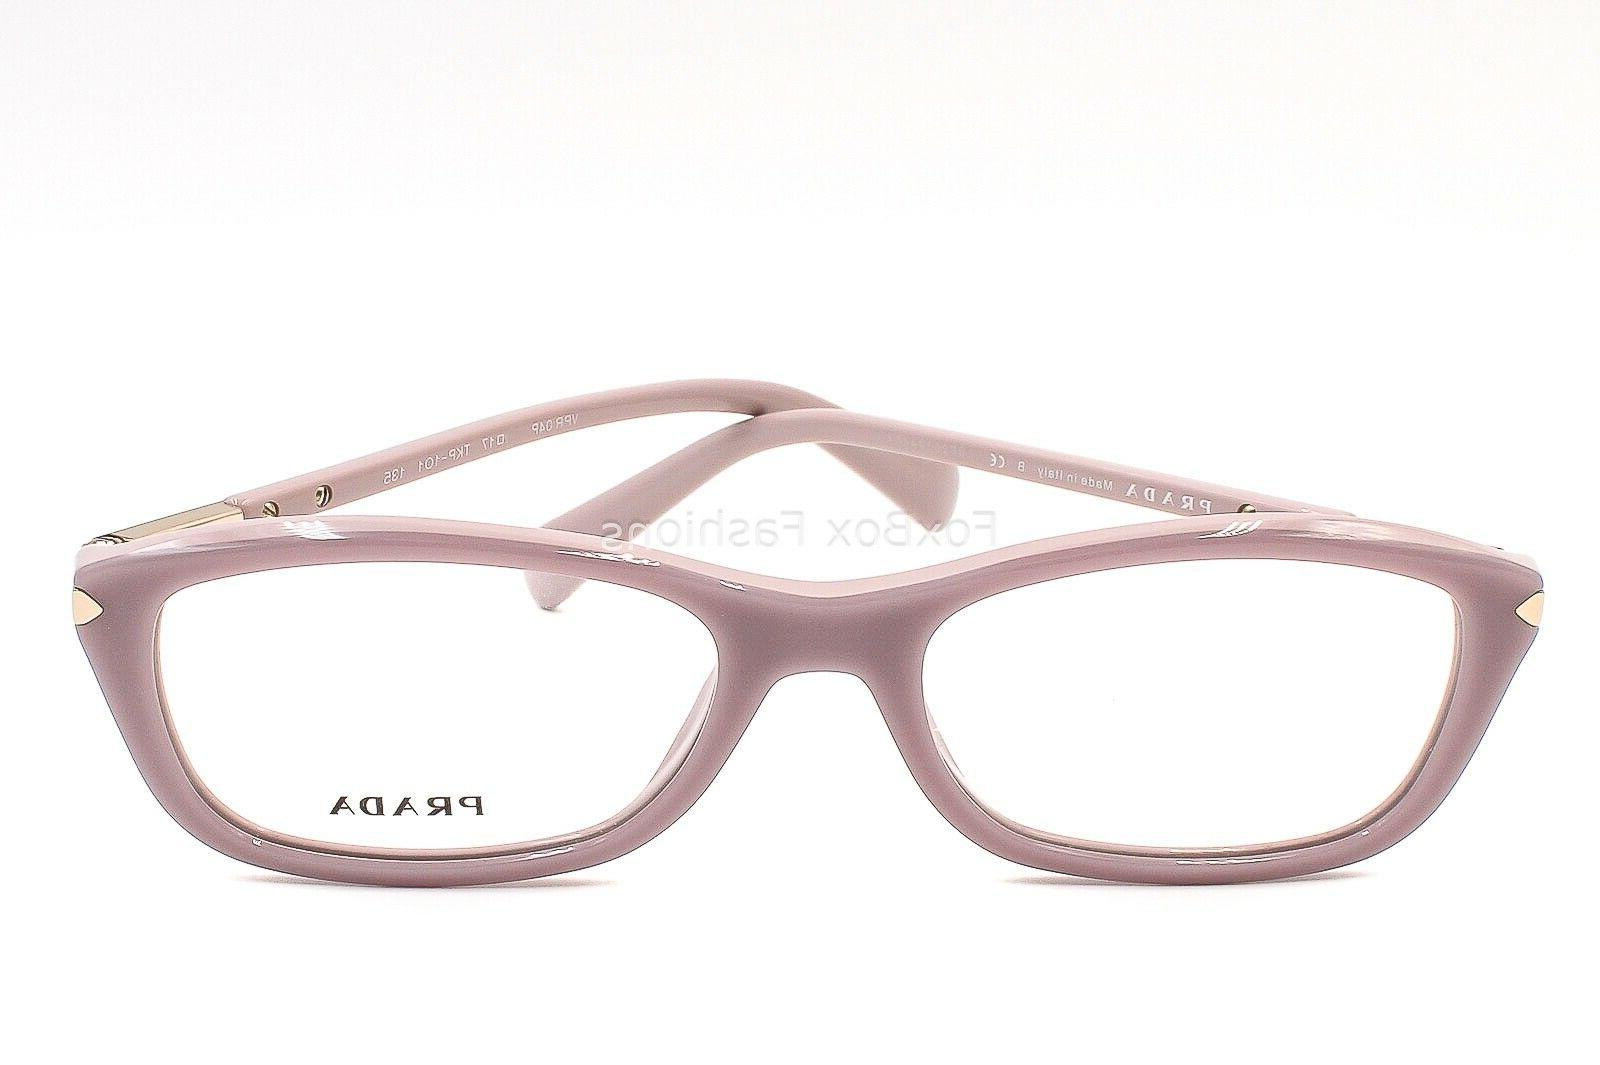 PRADA Eyeglasses Optical Glasses Opal